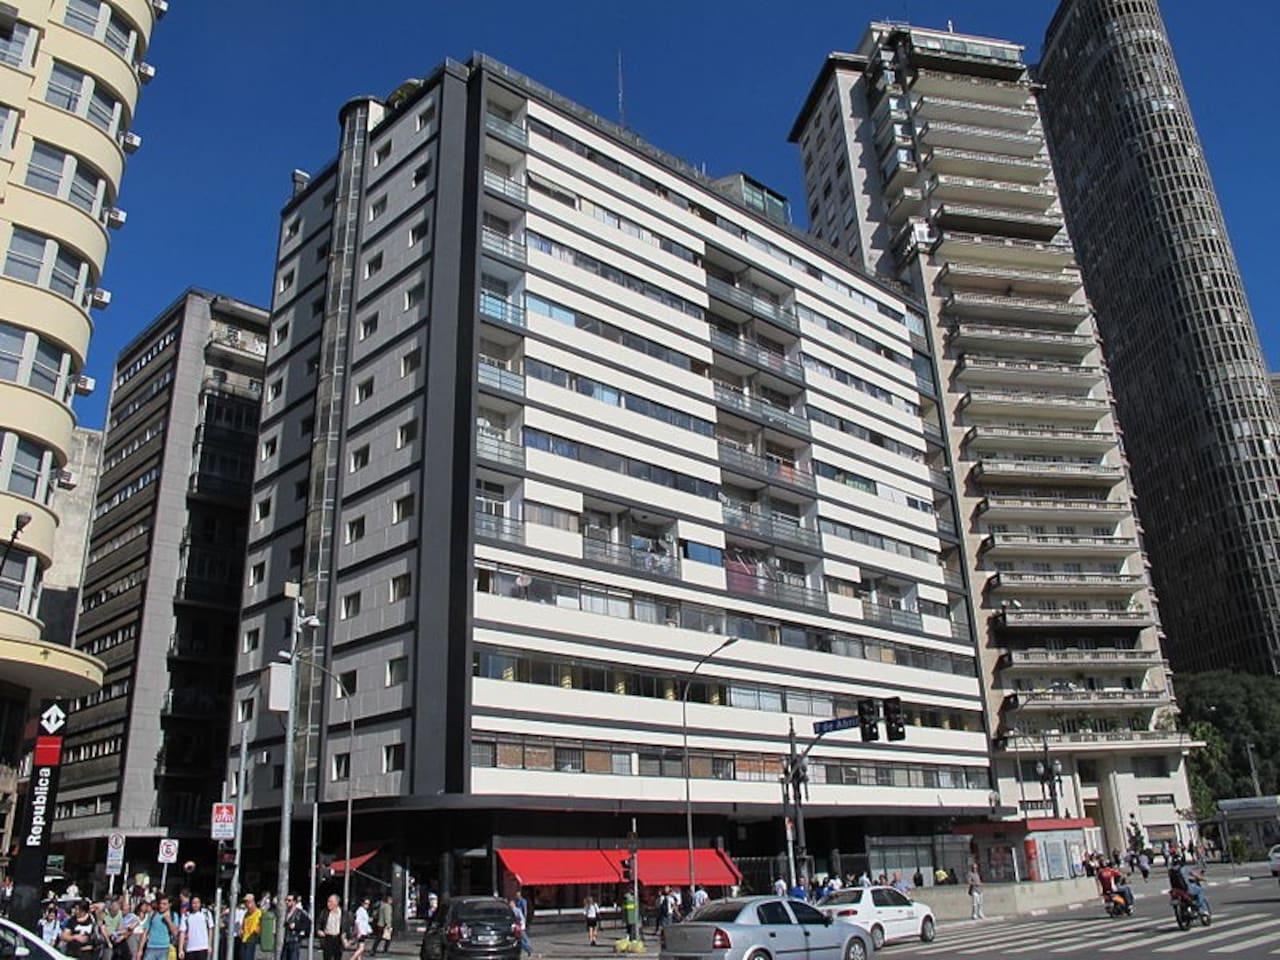 Edificio Esther, taken from Praça da Republica